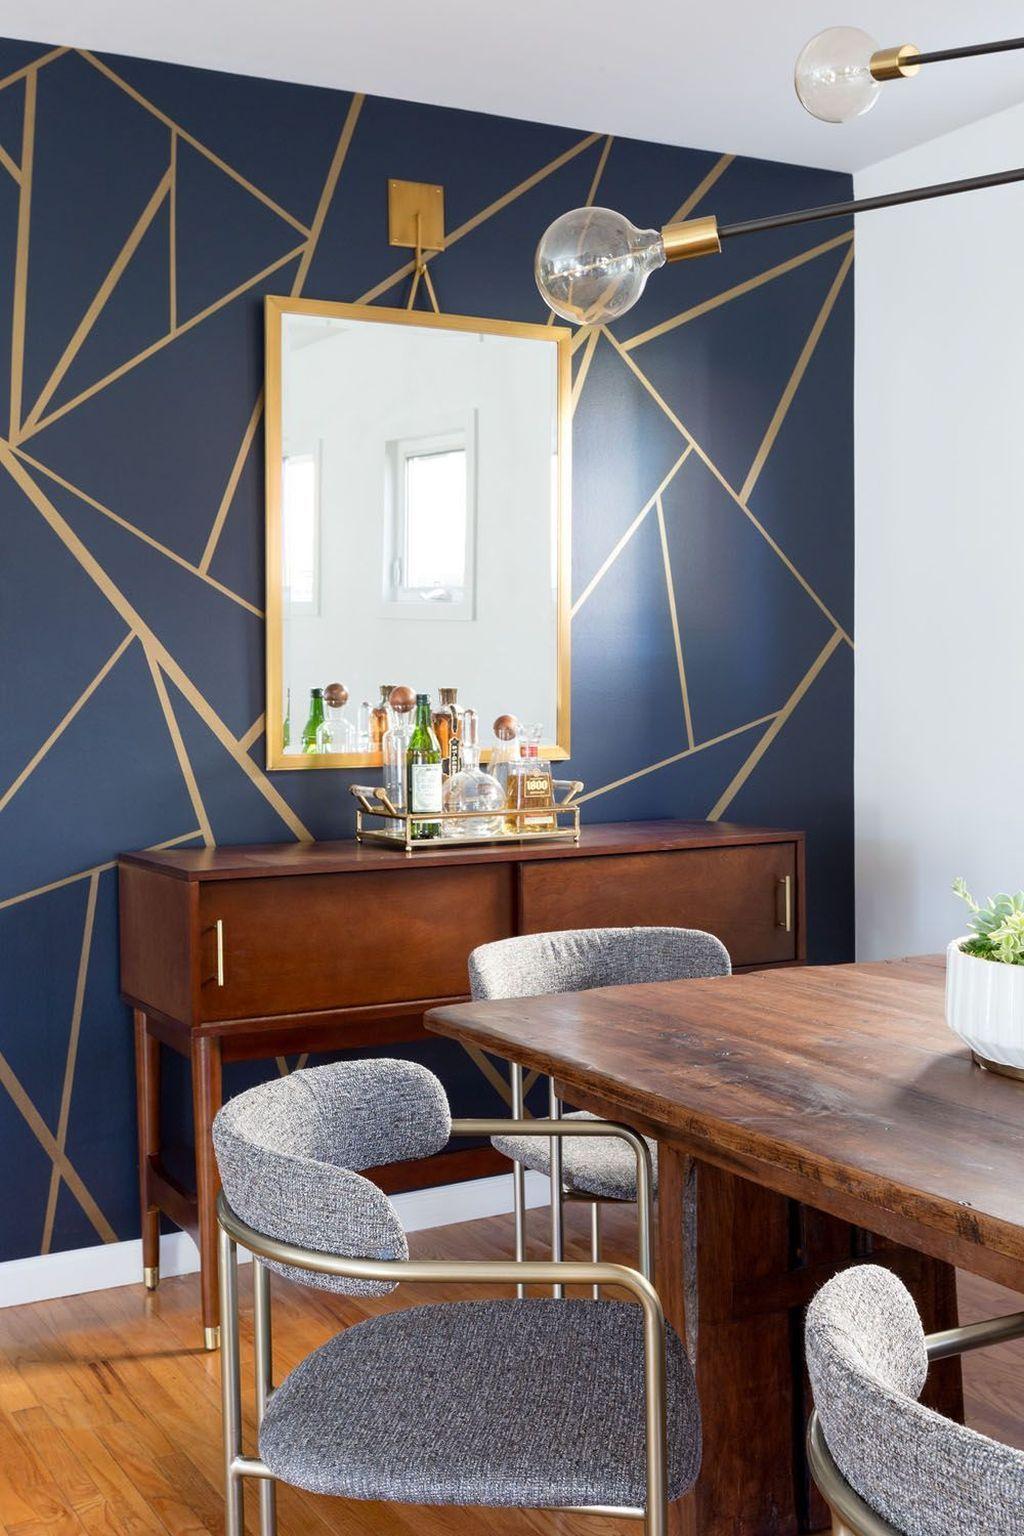 Cool impressive mid century modern living rooms design ideas midcenturymodernlivingrooms also rh pinterest